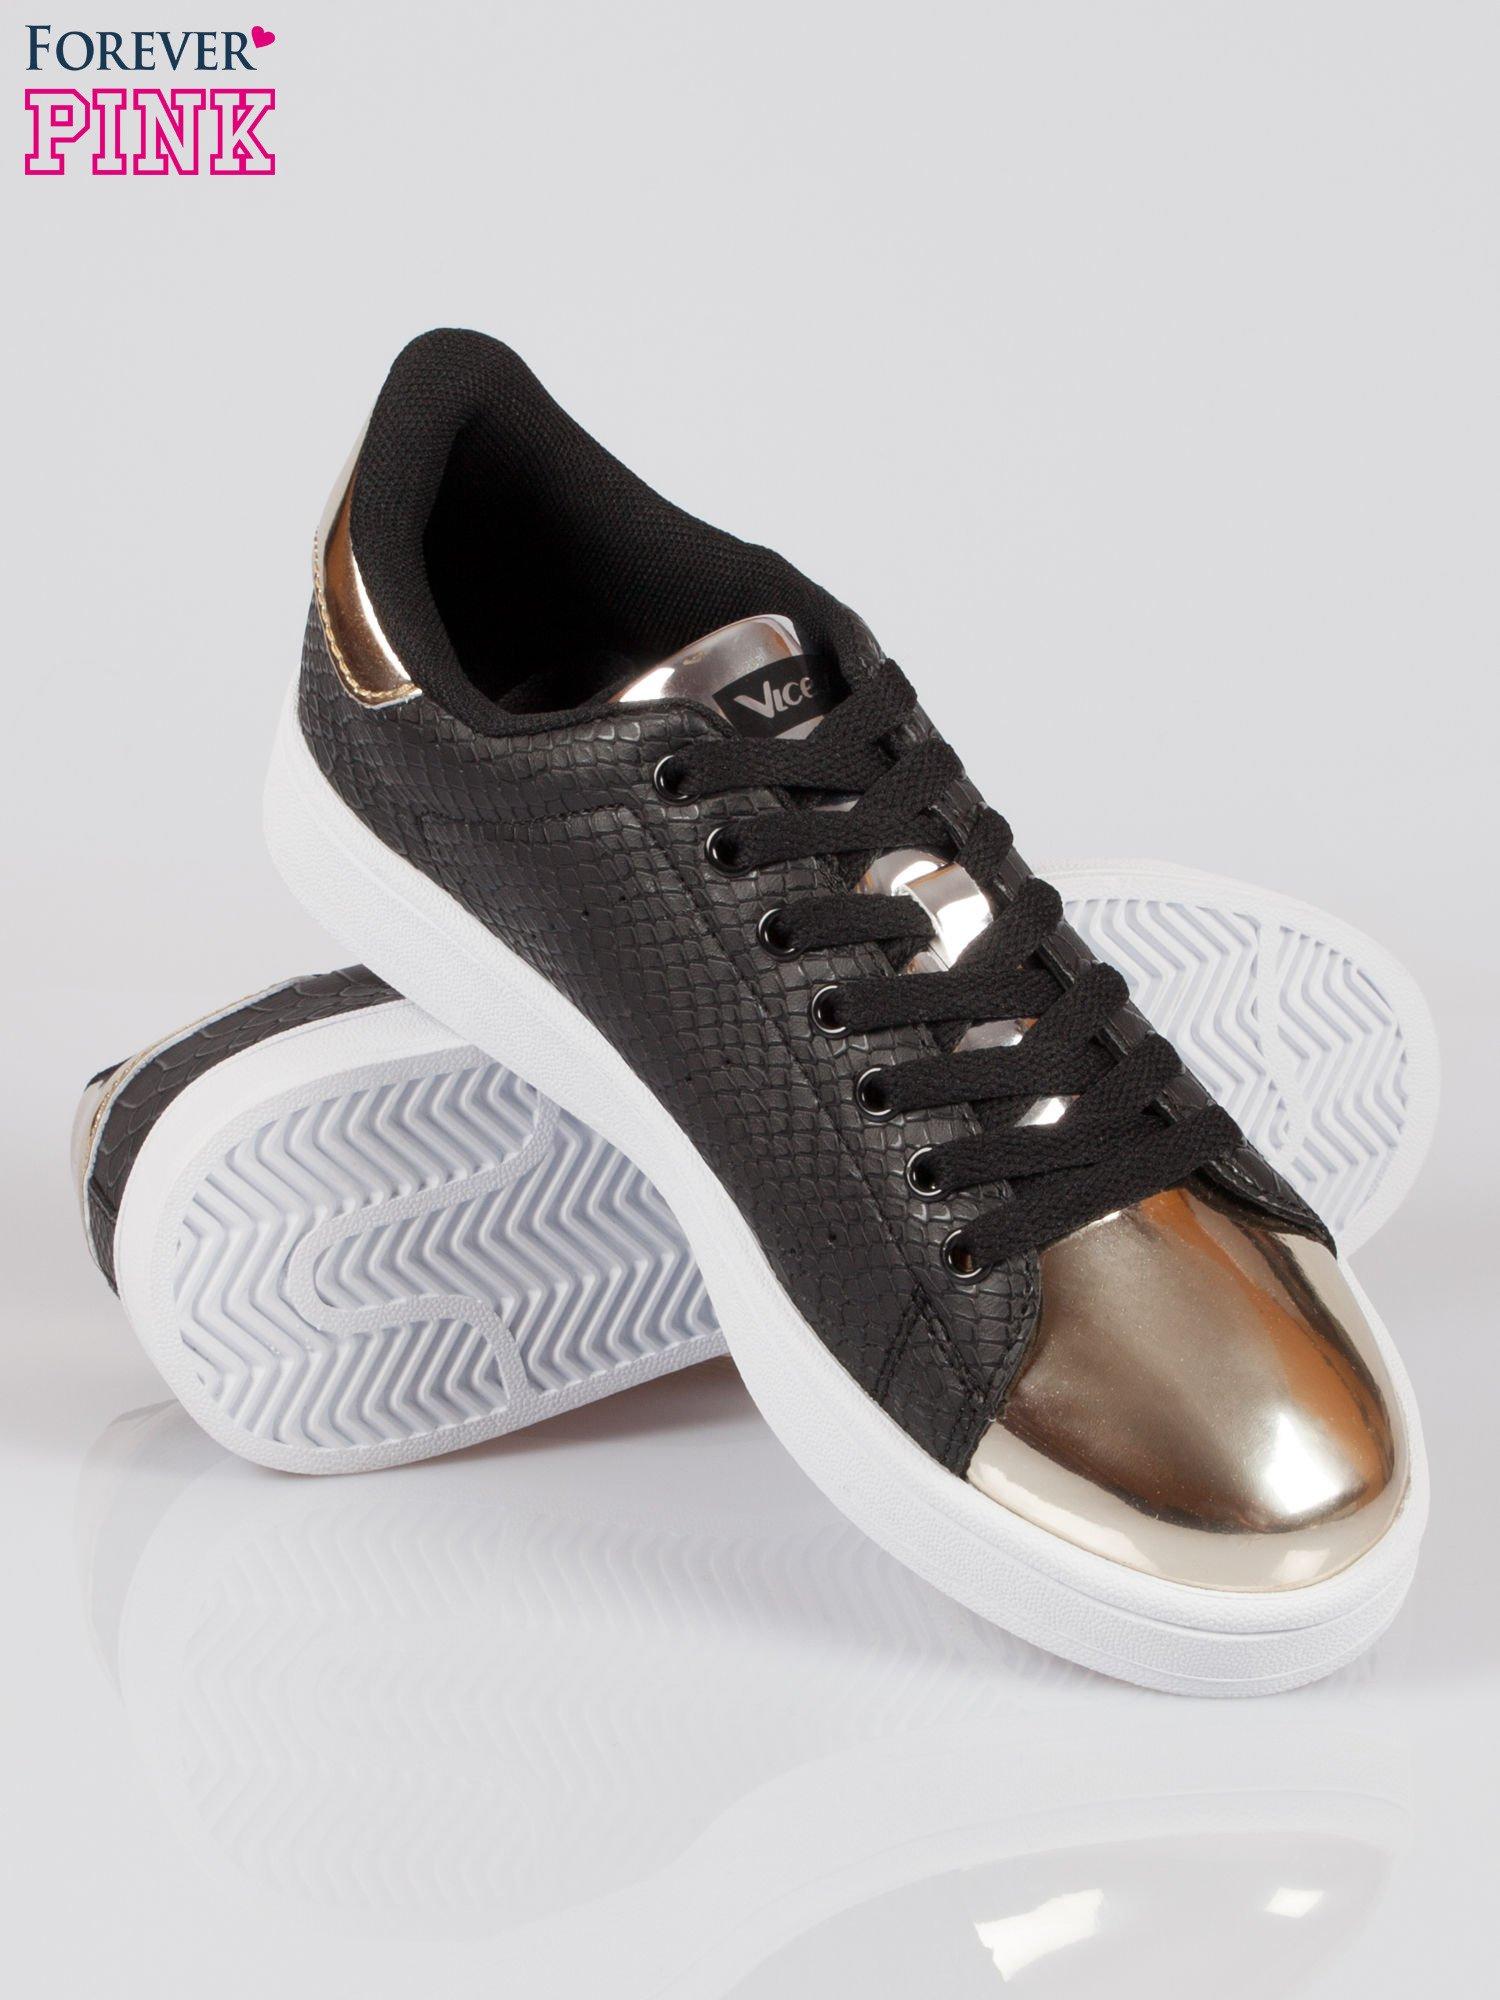 Czarne wężowe buty sportowe gold cap toe                                  zdj.                                  4